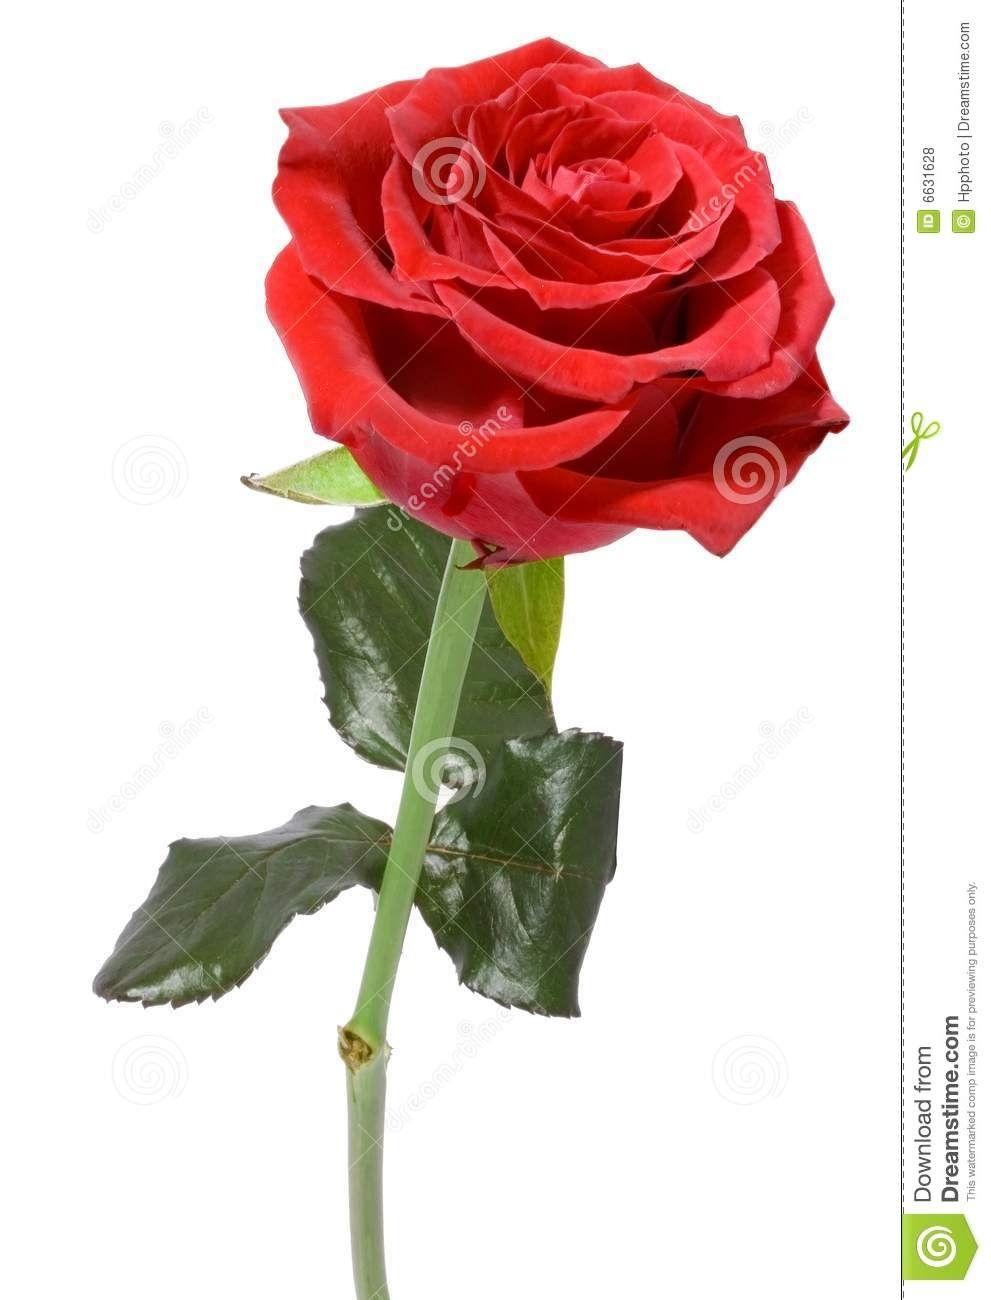 single red rose stock photo. image of decorative, flora - 6631628